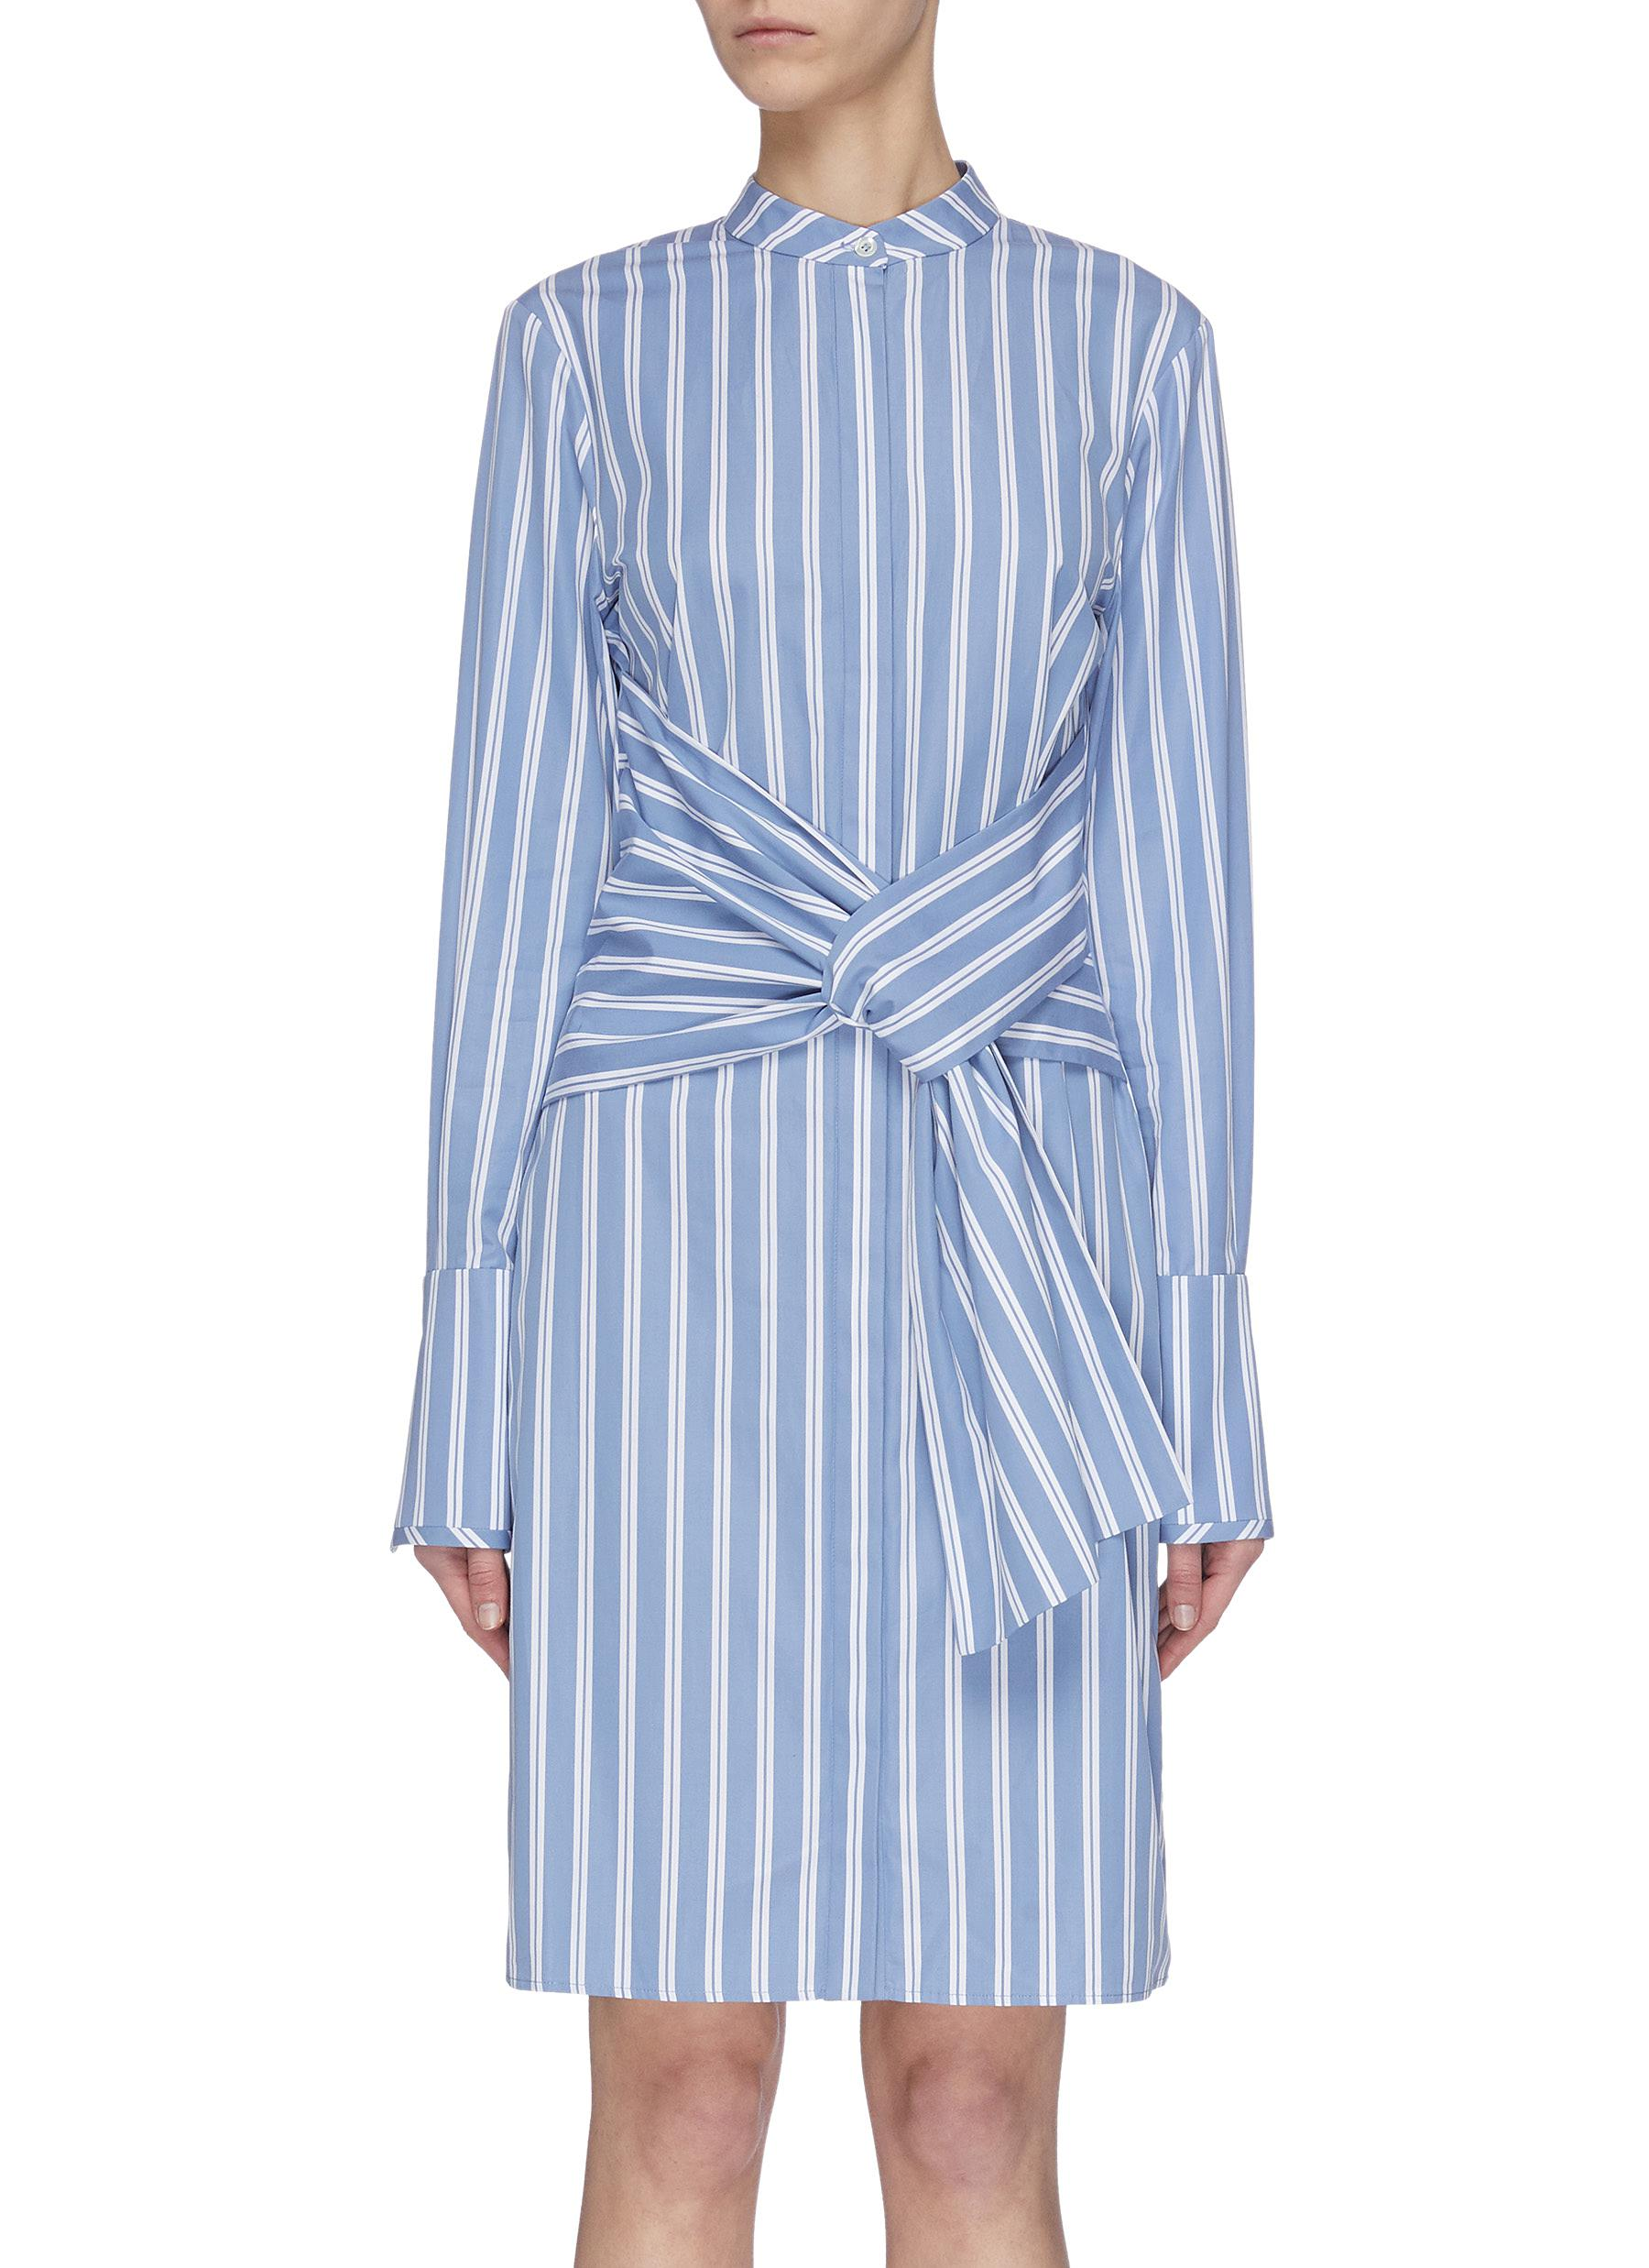 Buy Victoria, Victoria Beckham Dresses Double stripe tie waist shirt dress